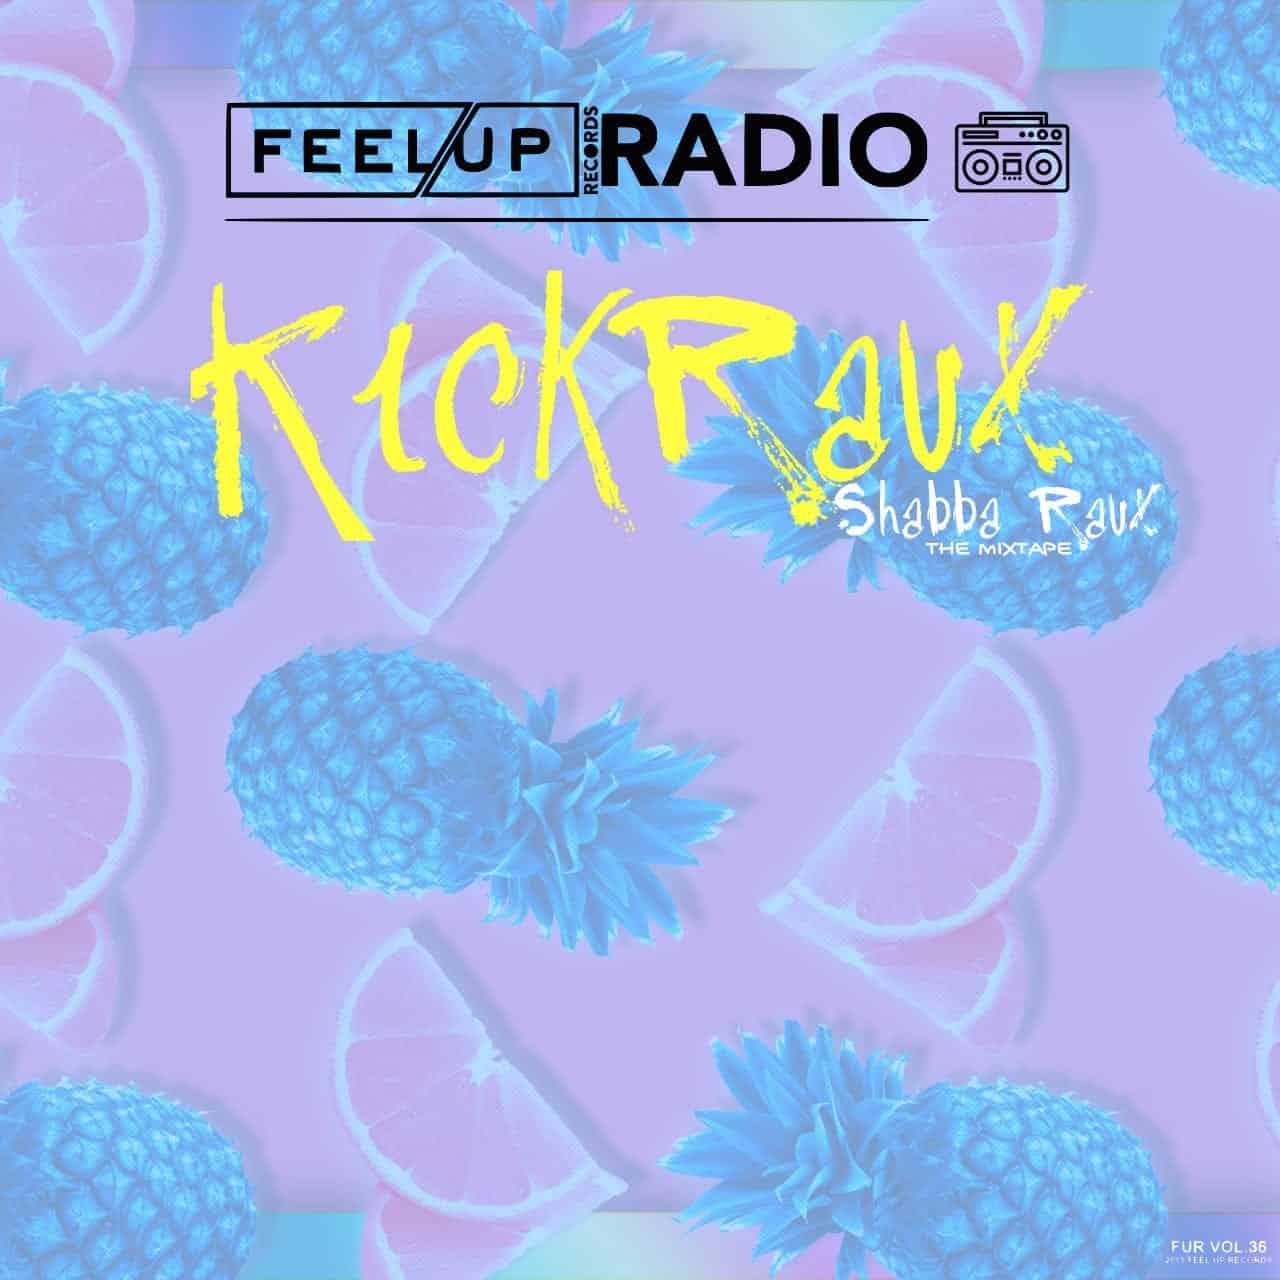 KickRaux - Shabba Raux The Mixtape - Feel Up Radio Vol 36